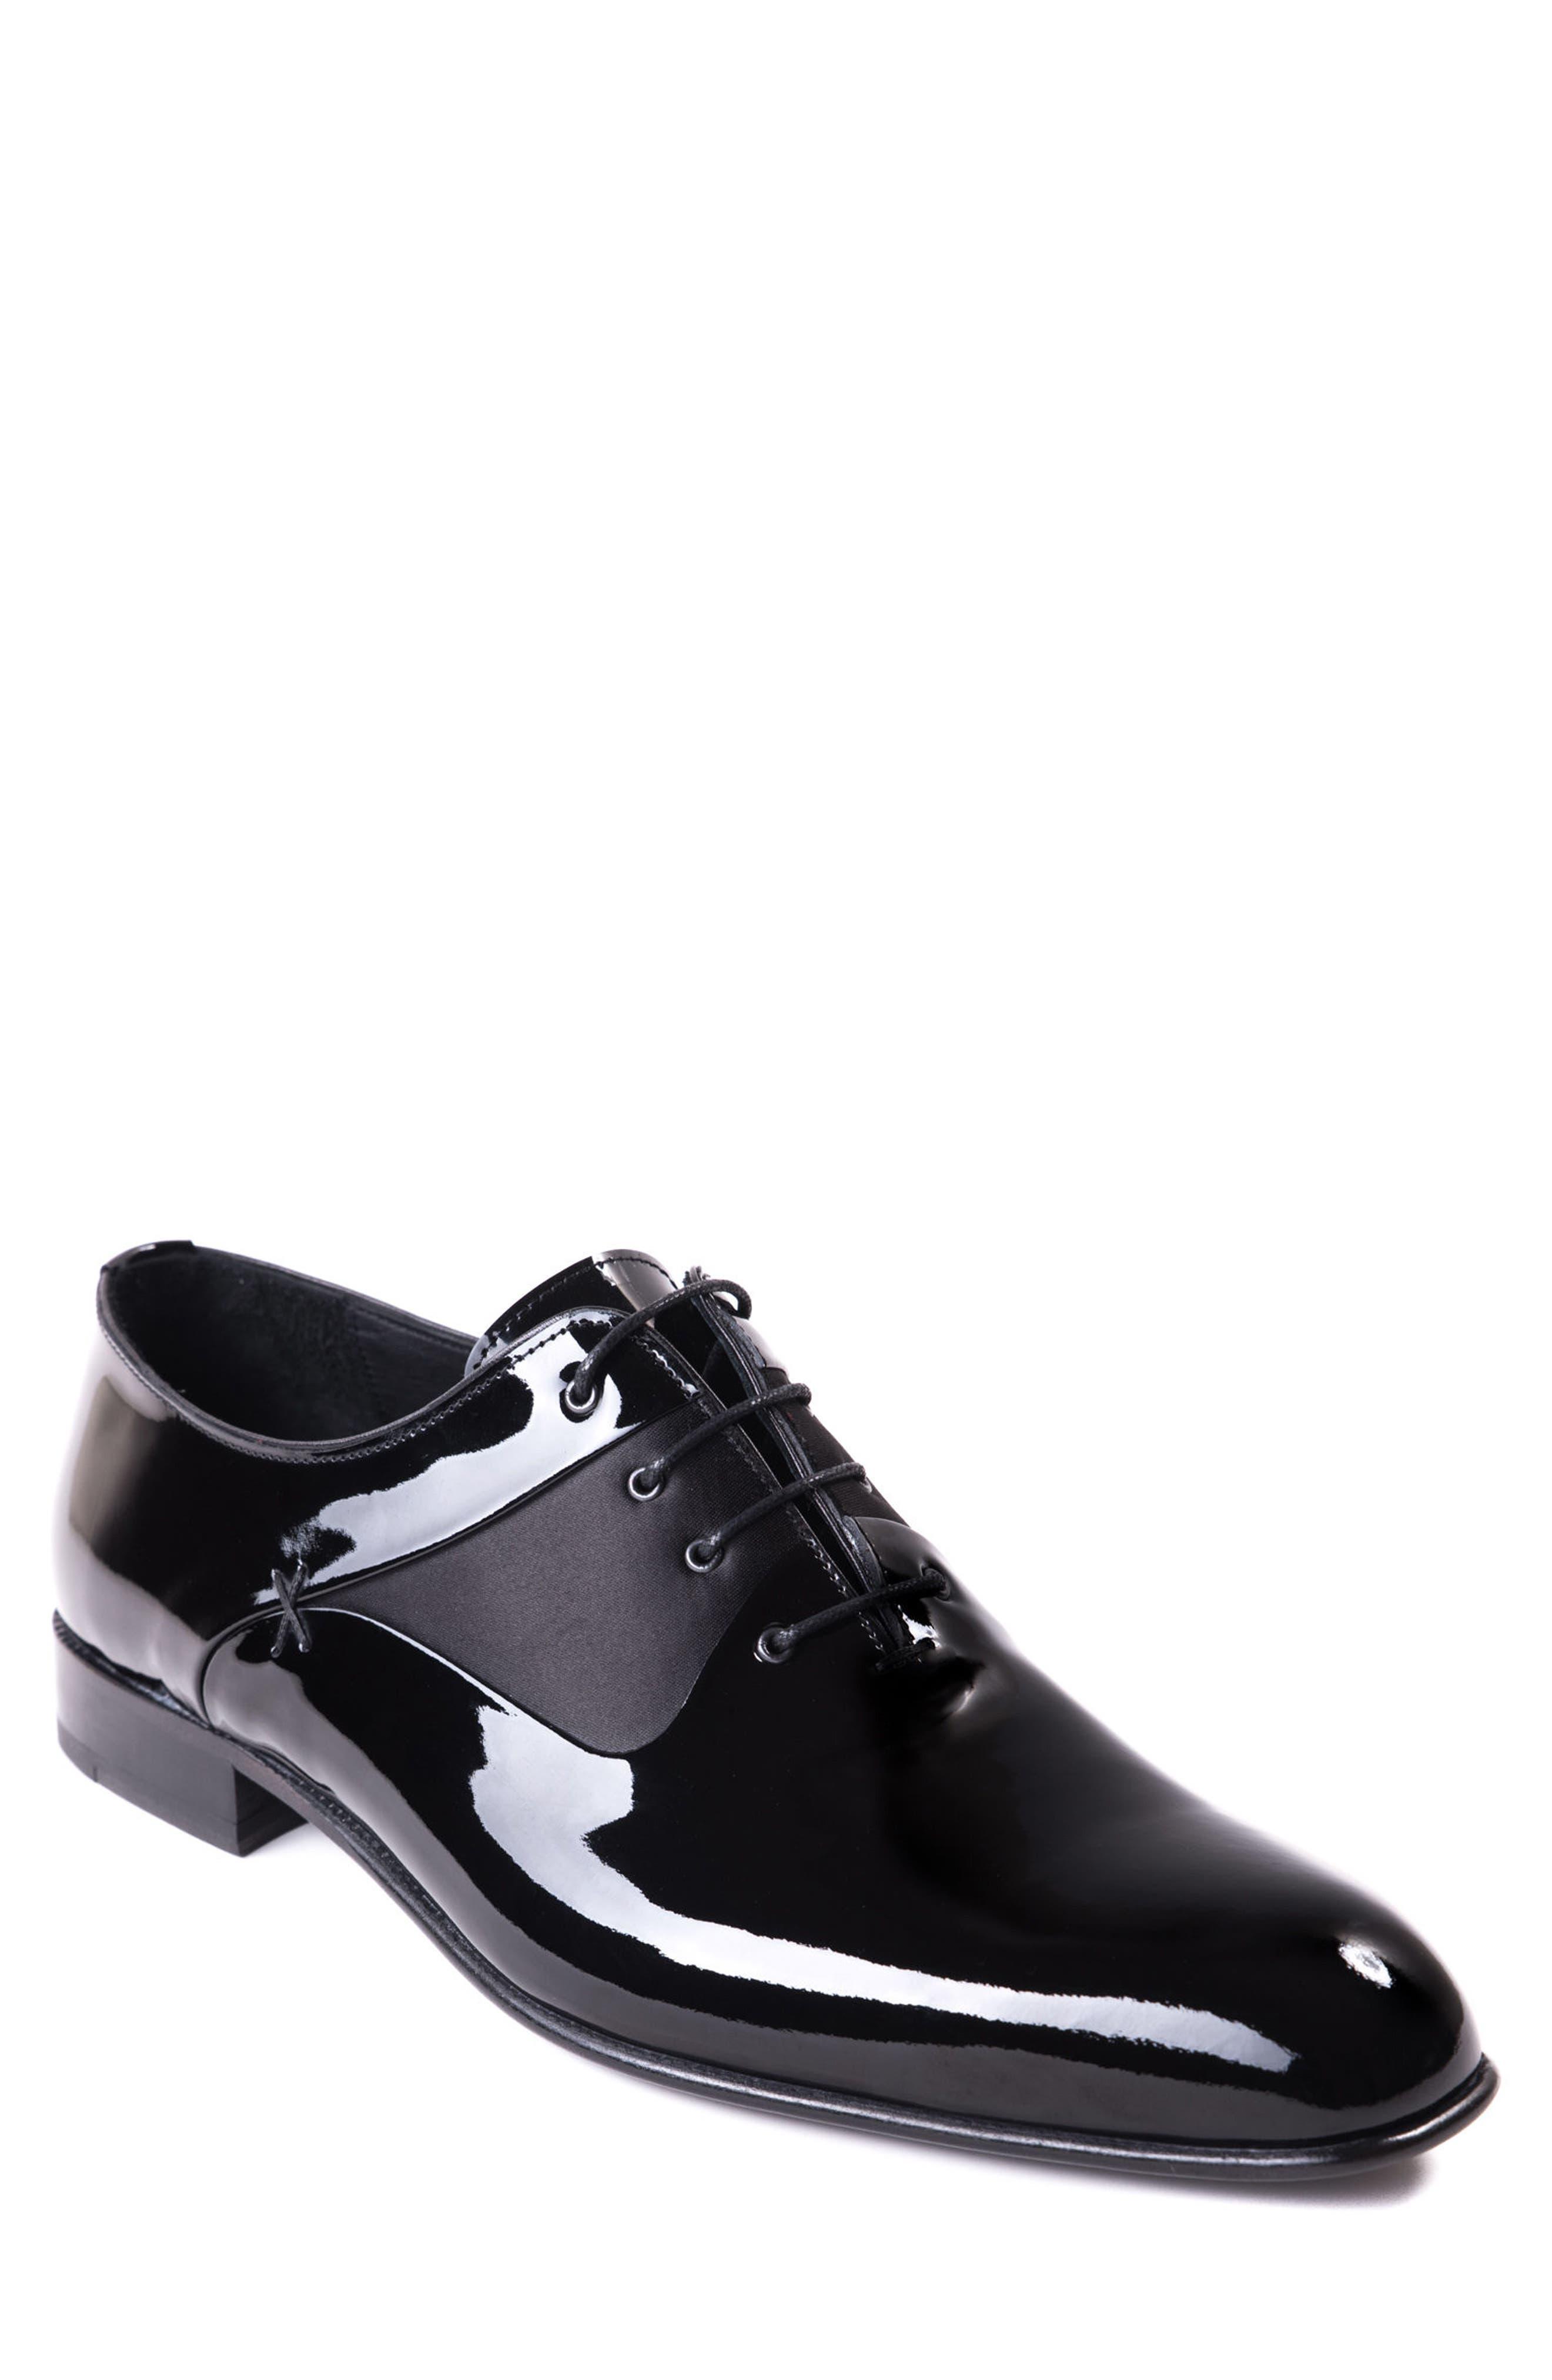 Ricci Plain Toe Oxford,                         Main,                         color, Black